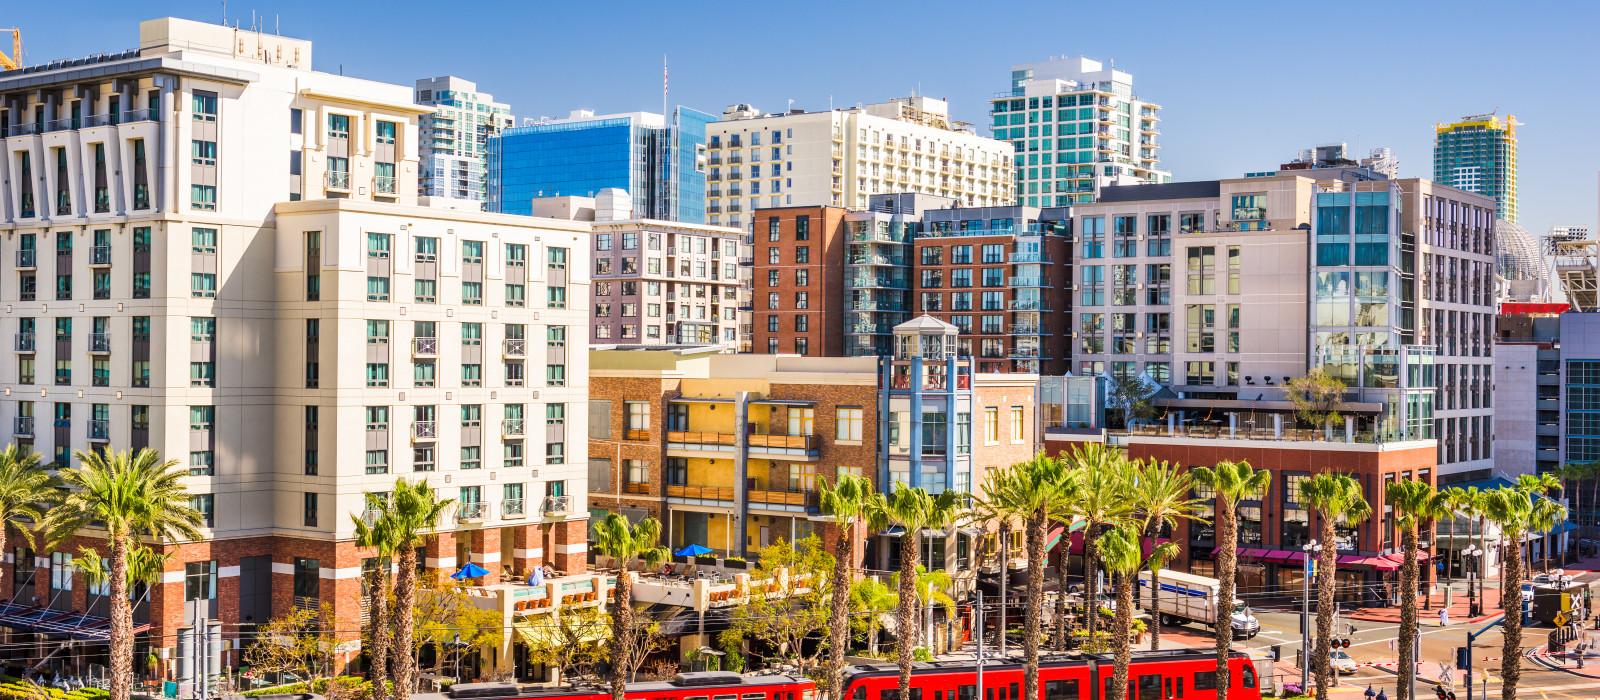 Reiseziel San Diego USA